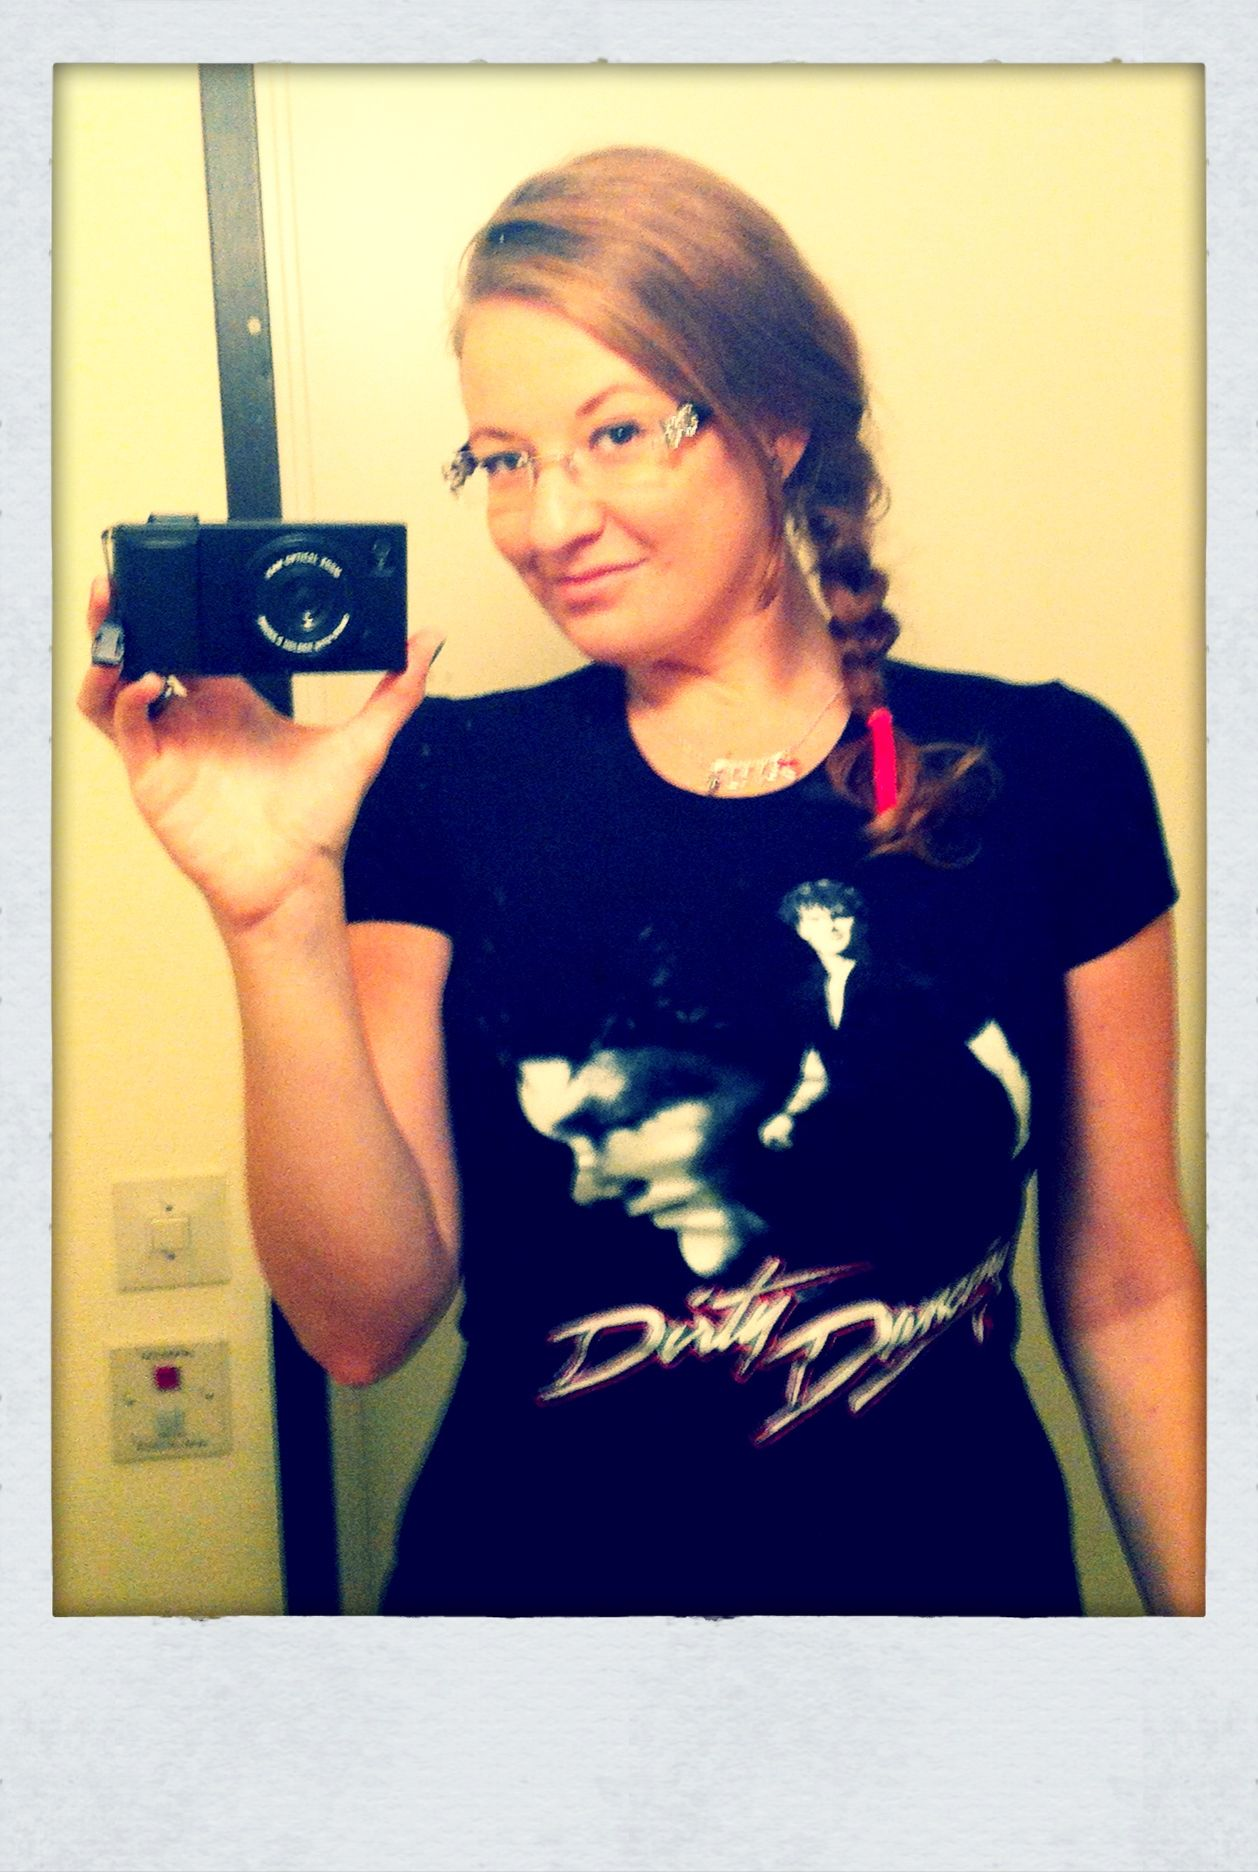 I ❤ Dirty Dancing!